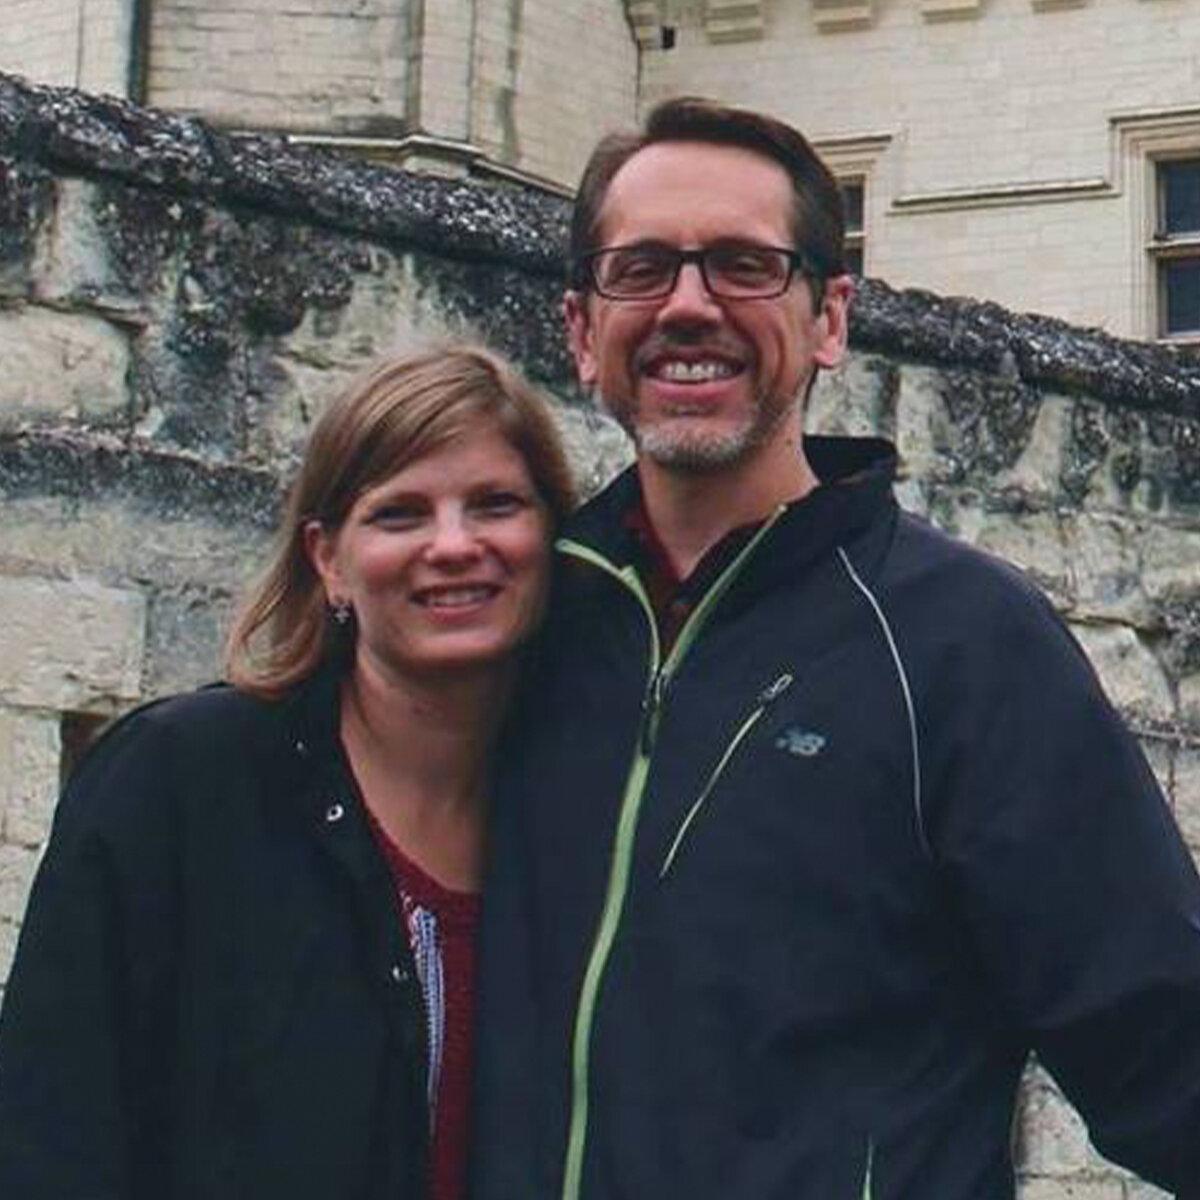 Blair & Dina bonin, Students For Christ European Coordinator